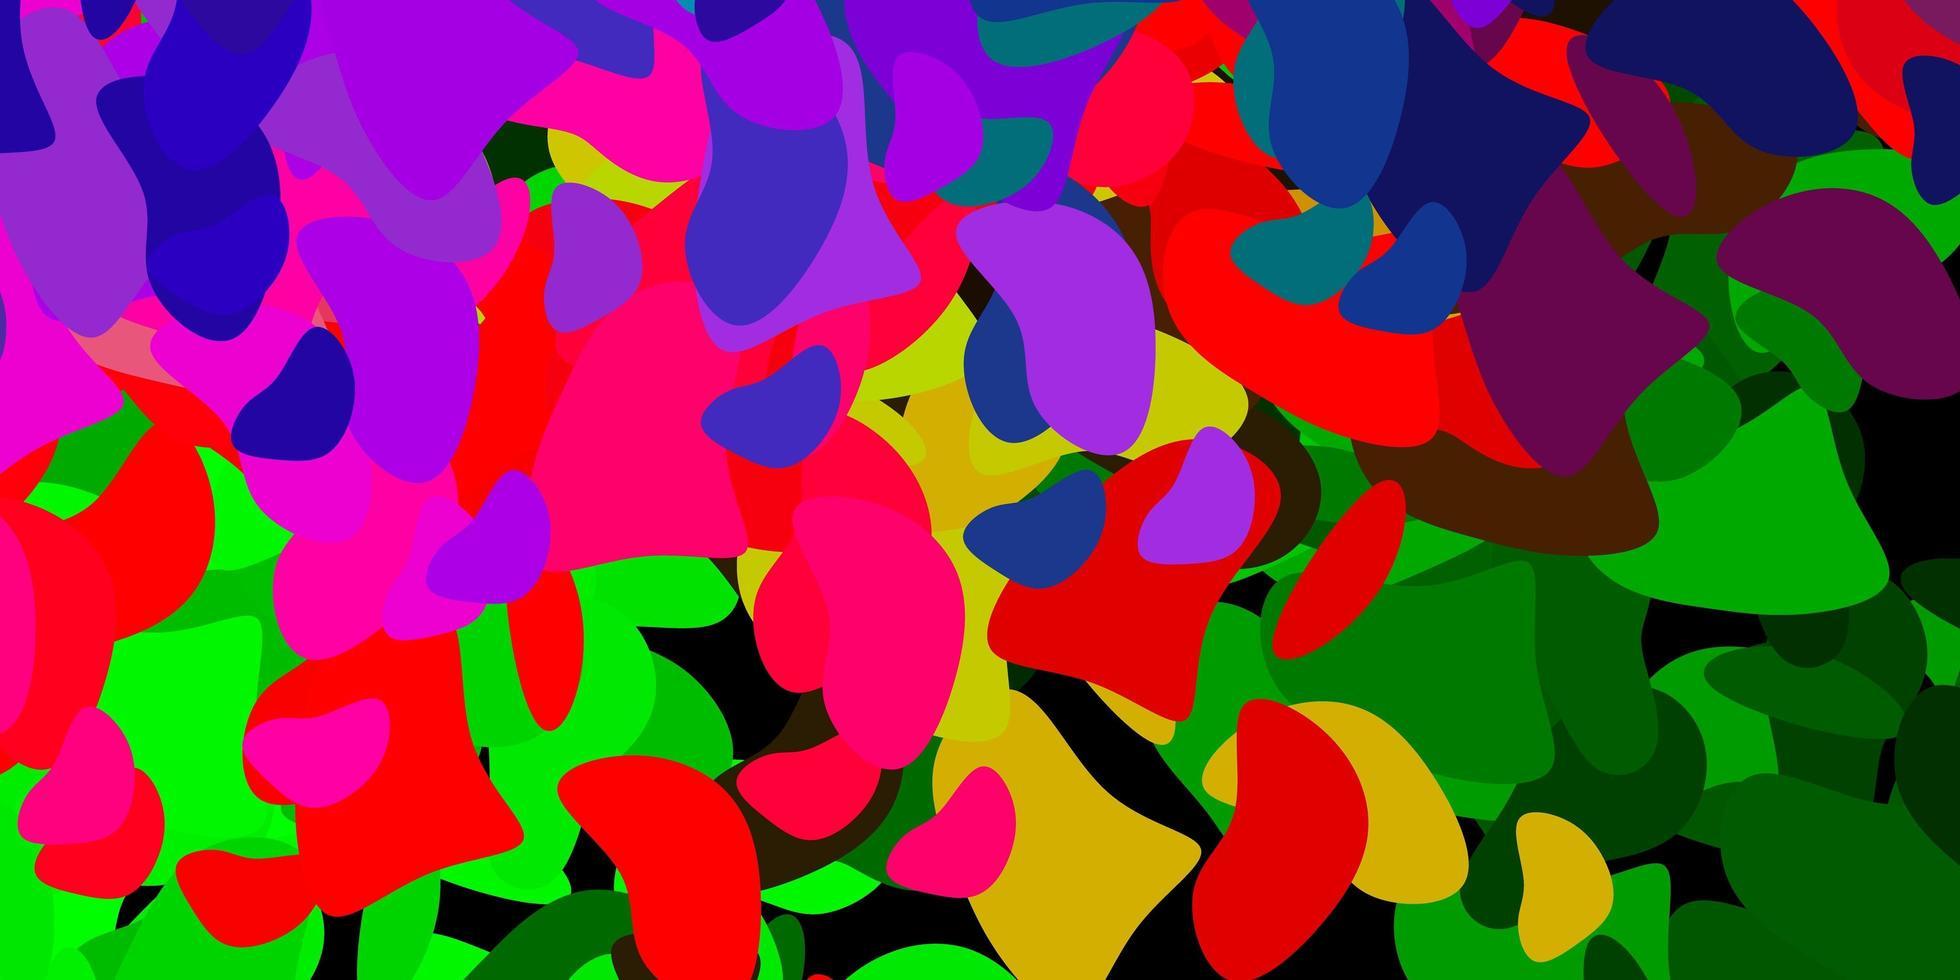 textura vector rosa claro, verde com formas de memphis.